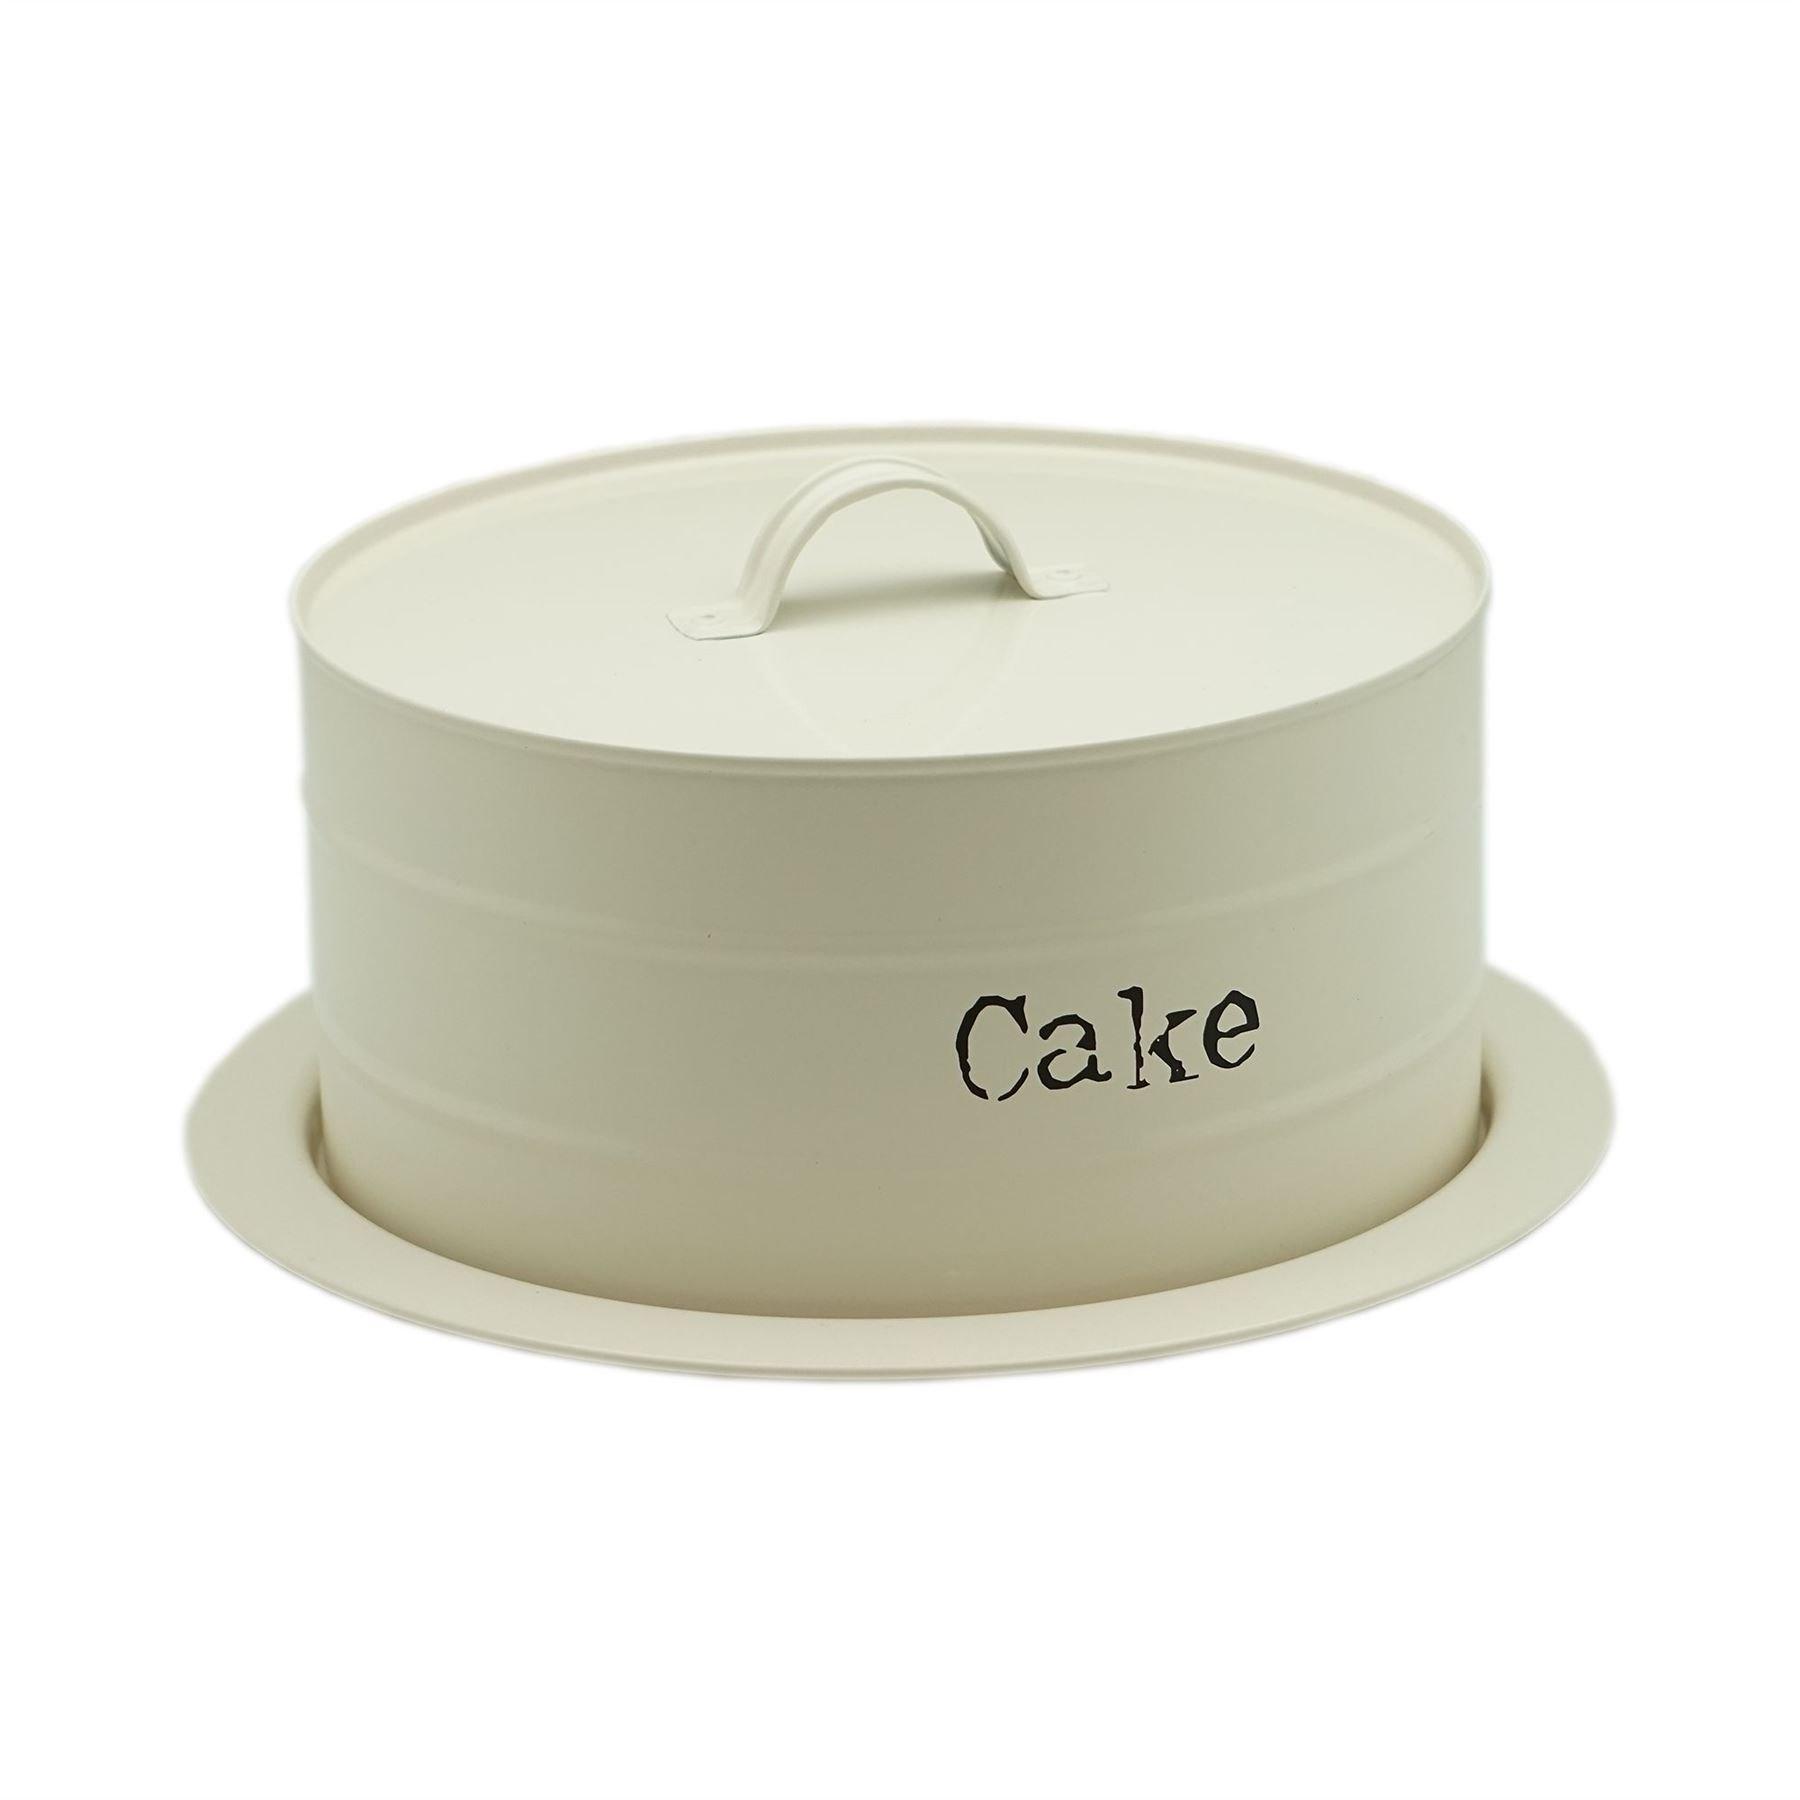 Metal Airtight Cake Storage Tin / Cake Dome -270x115mm - Cream